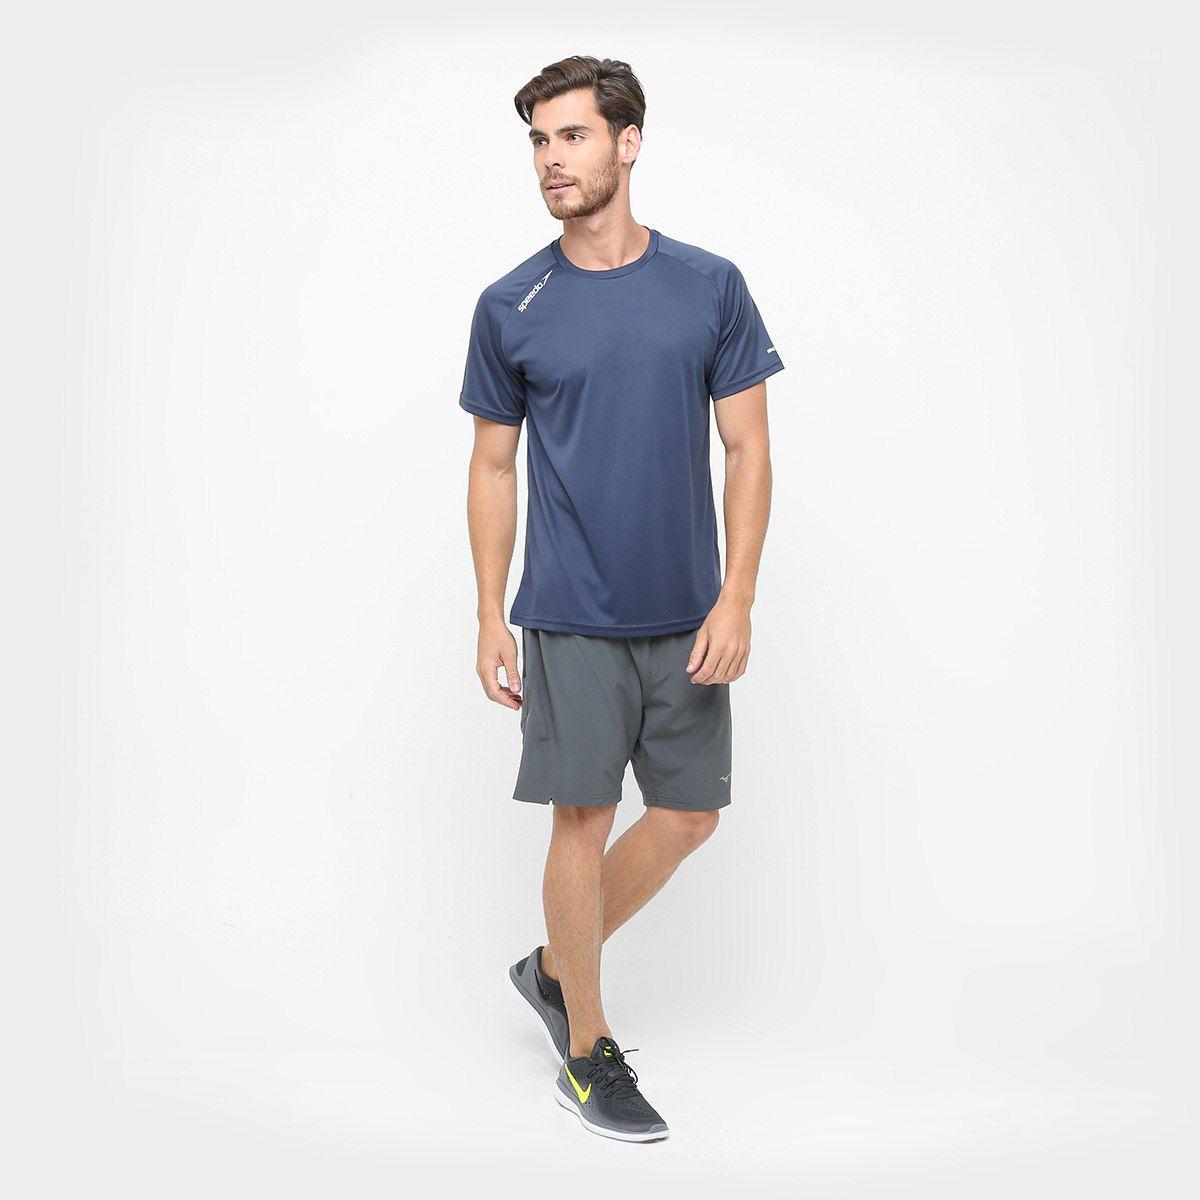 Camiseta Sppedo Masculina Raglan Basic UV50 Azul  Marinho